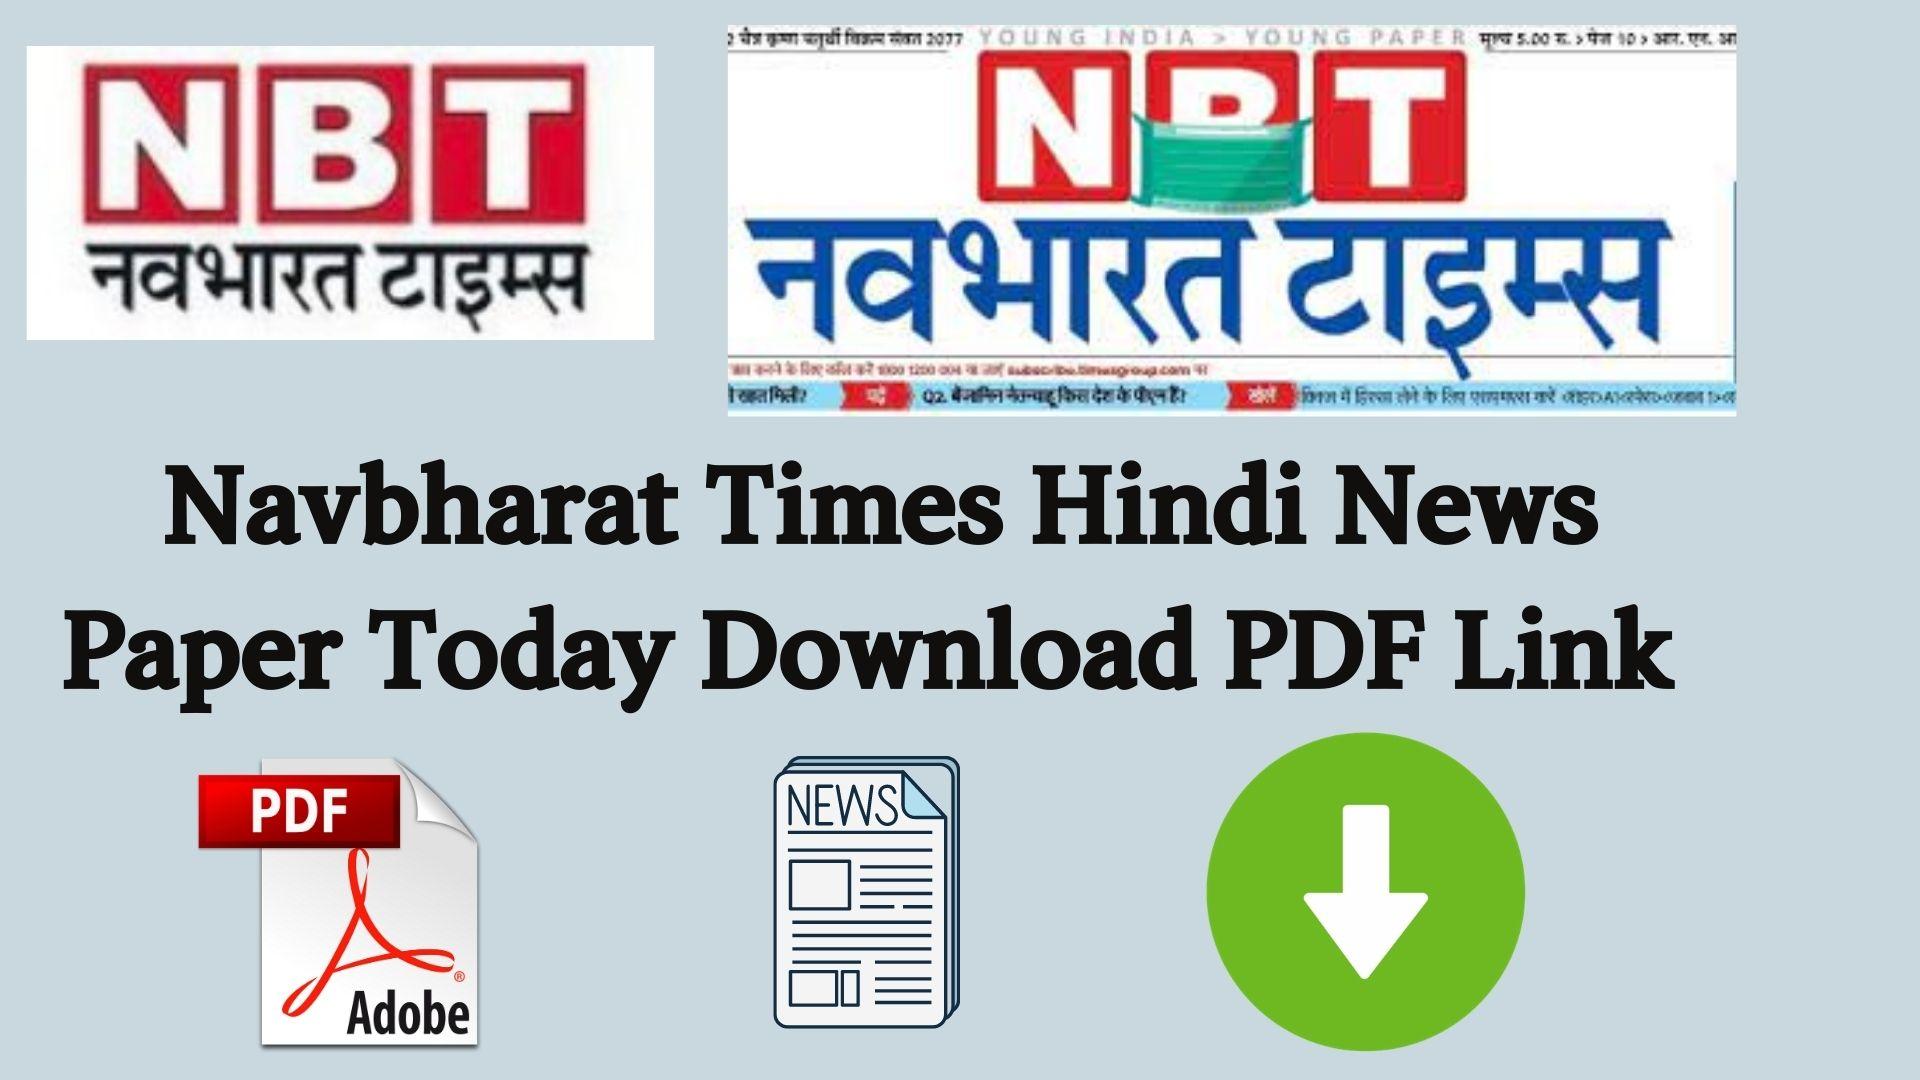 Navbharat Times Hindi News Paper Today PDF Download